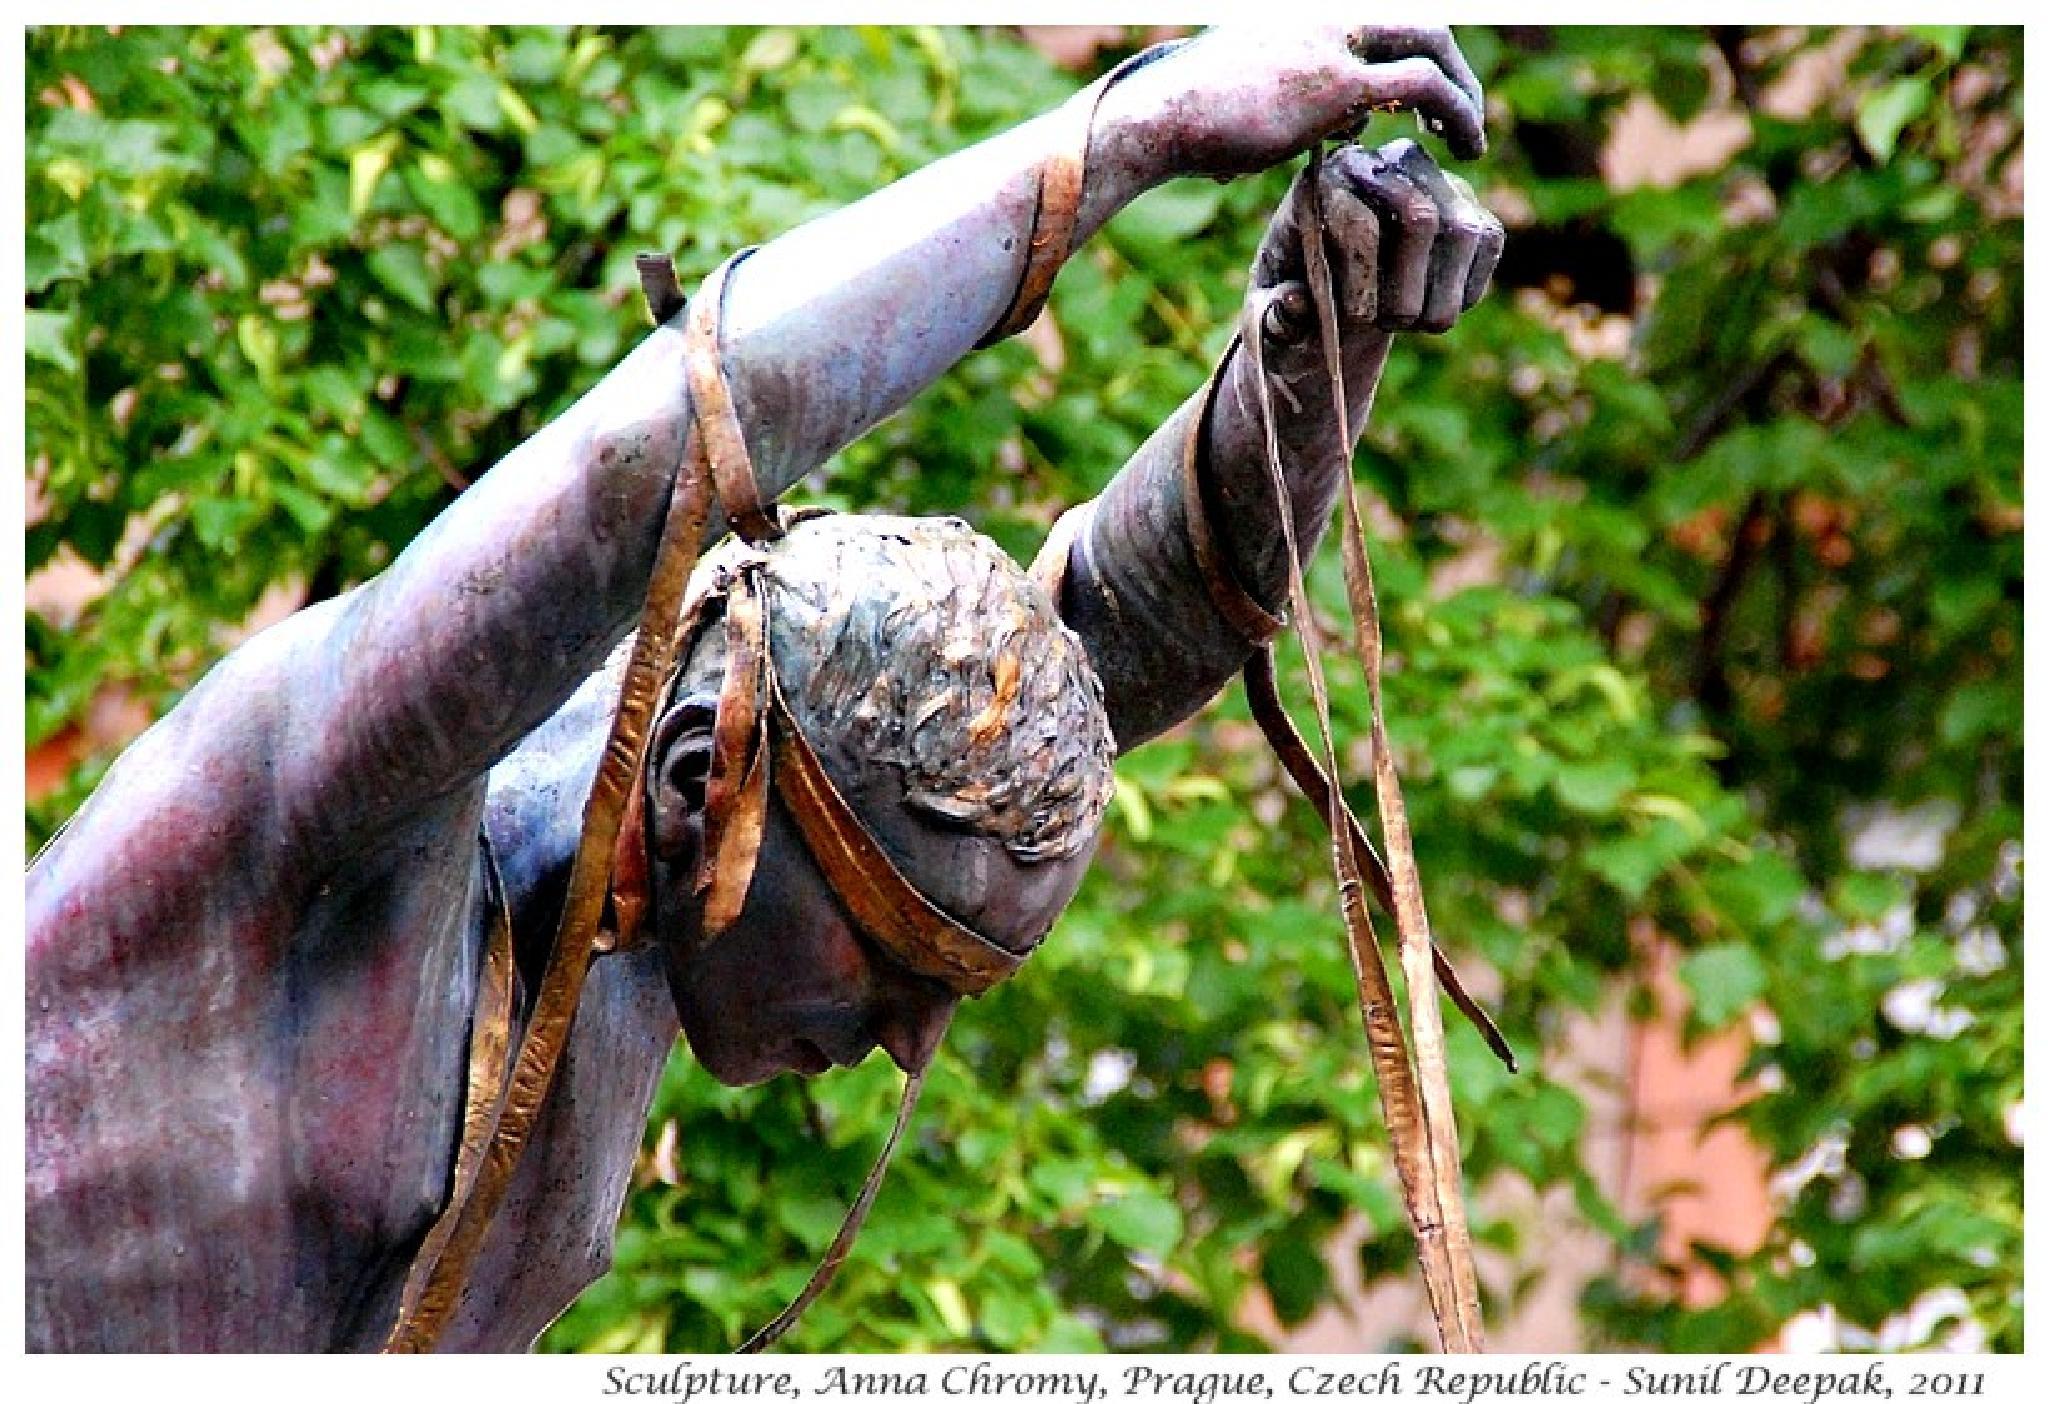 Ribbon dancer by Dr Sunil Deepak